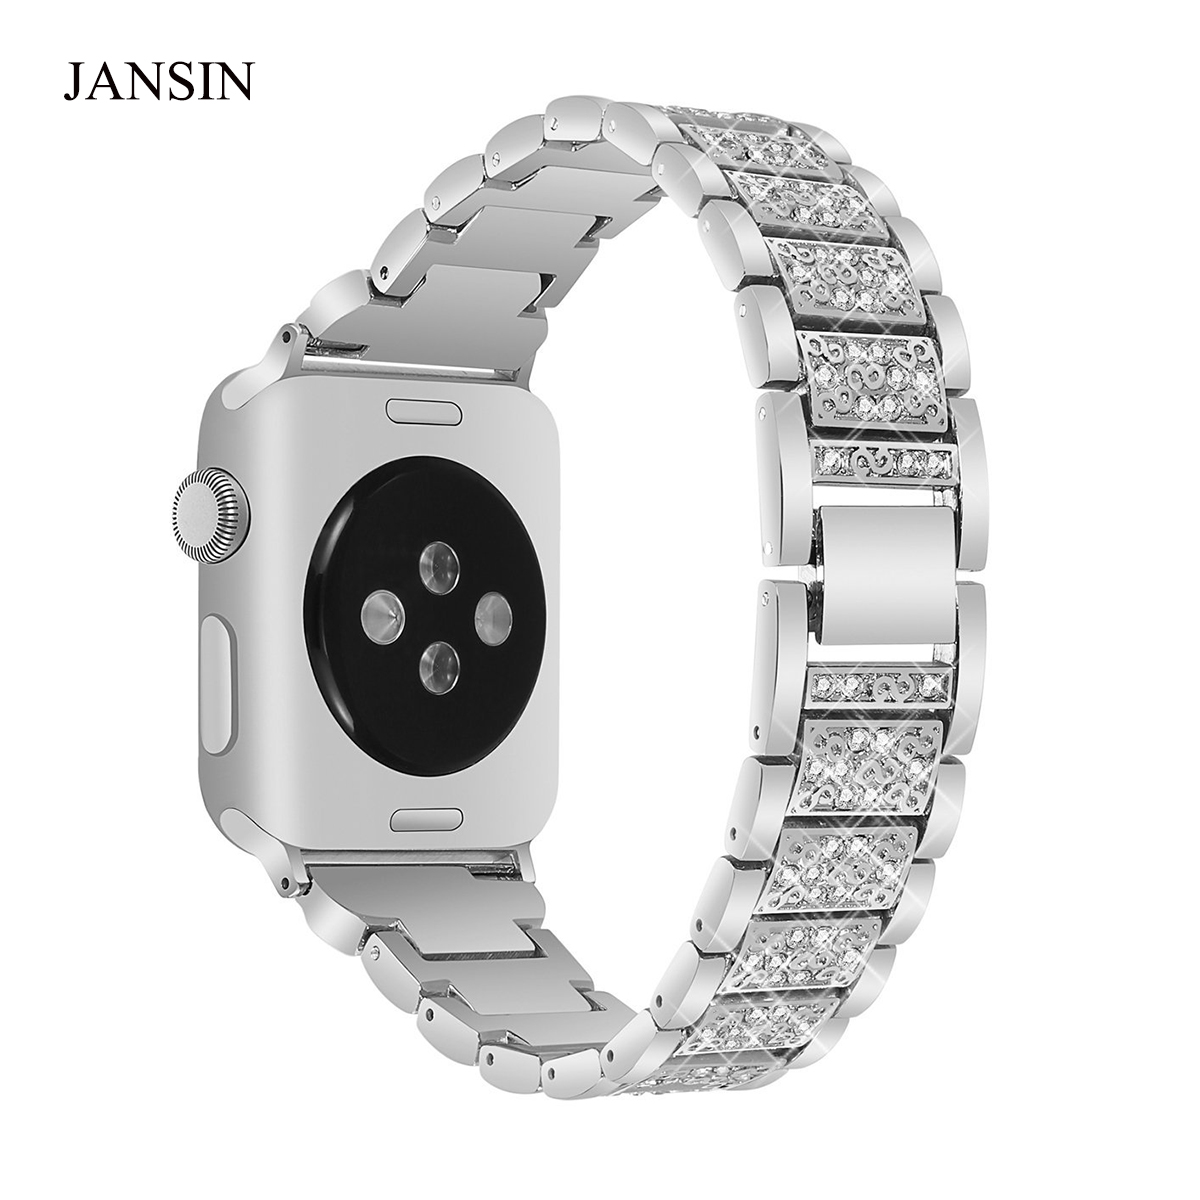 JANSIN Alloy Crystal Rhinestone Diamon Watch Band Luxury Stainless Steel Watch Bands for Apple Watch 38mm 42mm series 3 2 1 still diamon developer mode tool